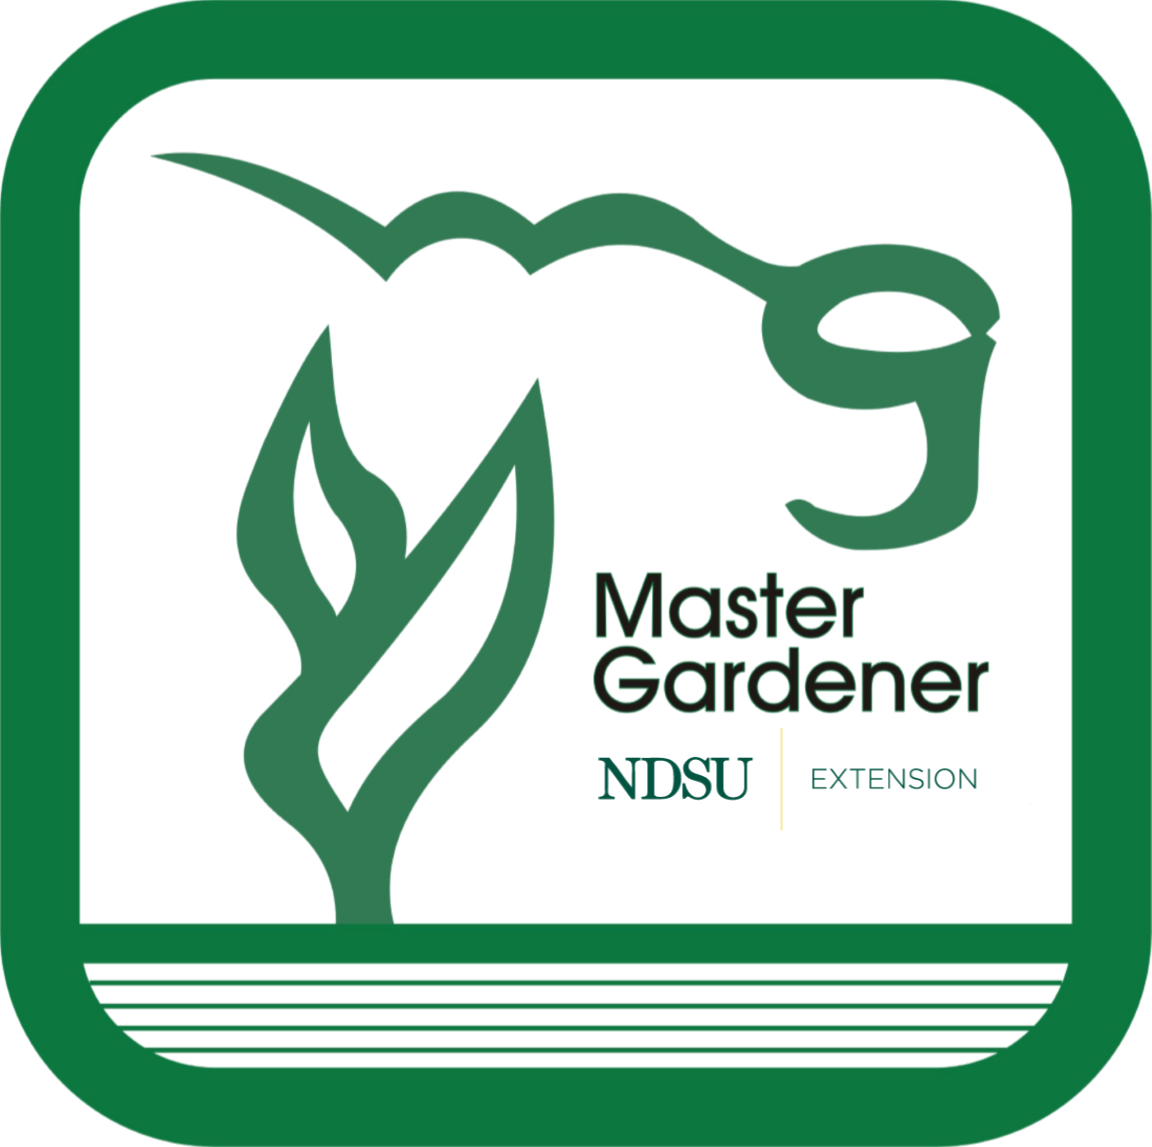 The NDSU Extension Master Gardener Blog